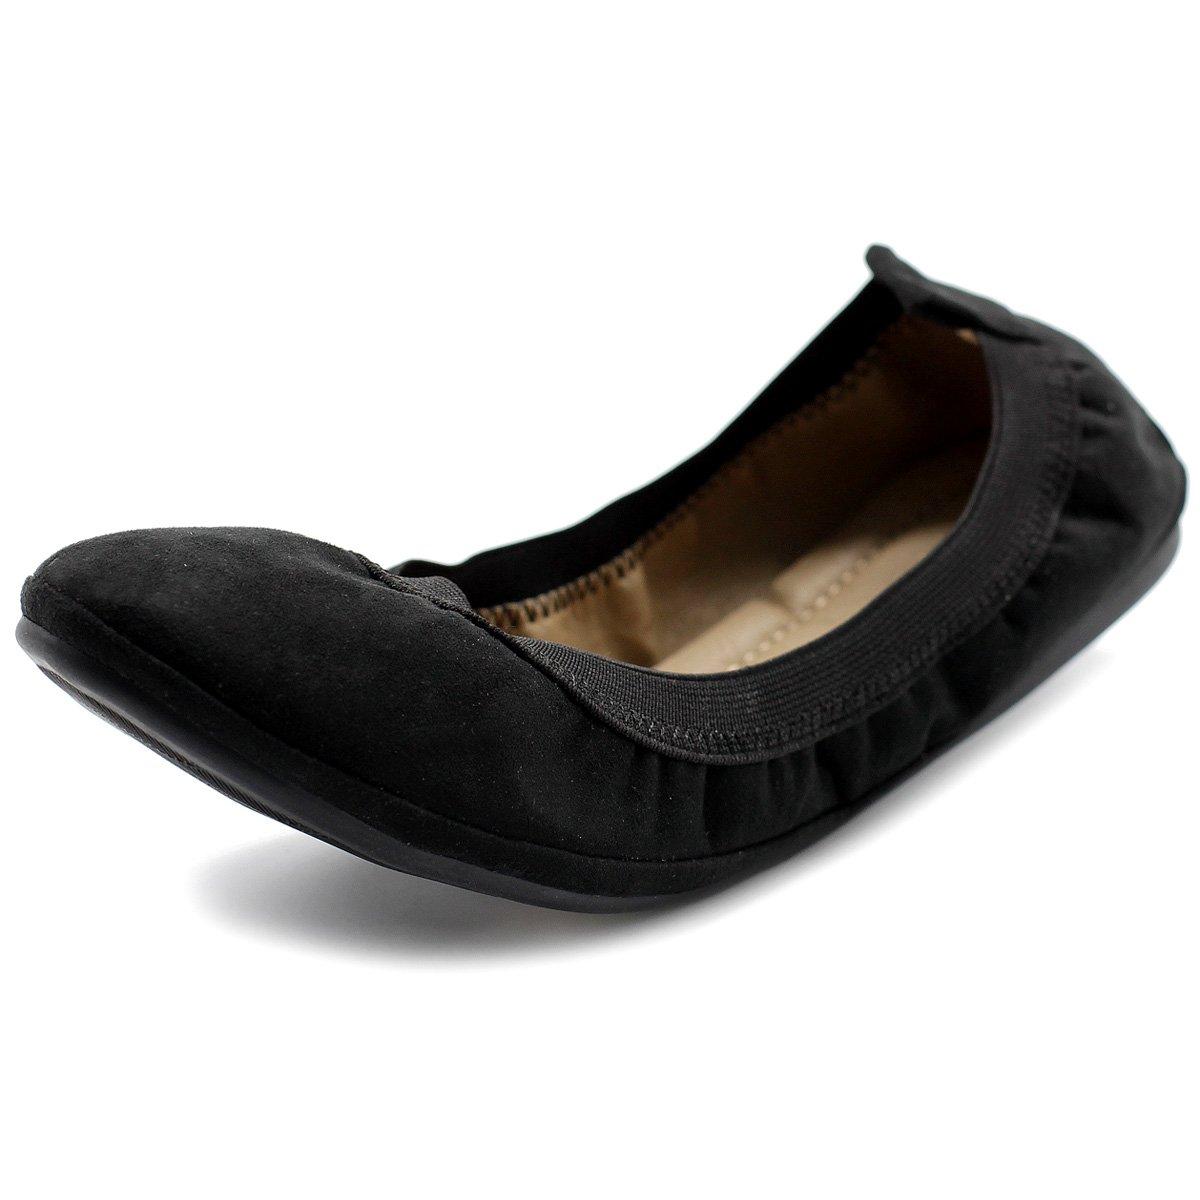 Ollio Women's Shoe Faux Suede Comfort Ballet Flat BN16(8 B(M) US, Black)